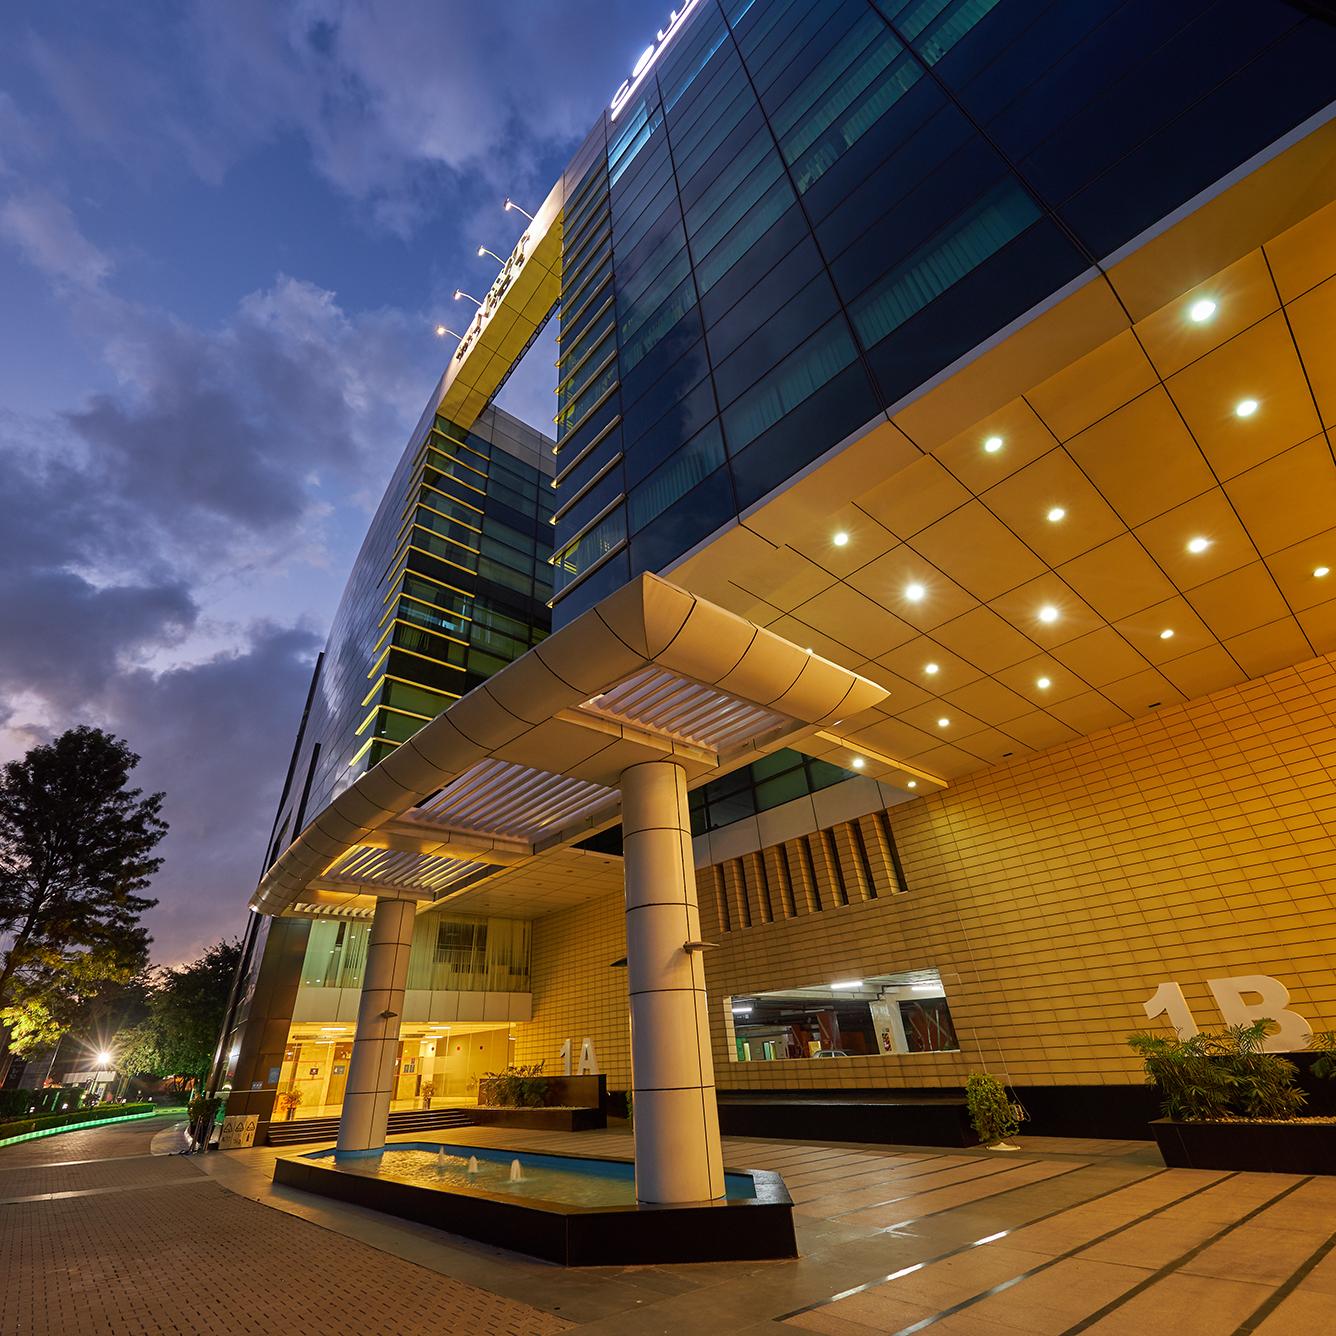 Entrance lobby for an office building